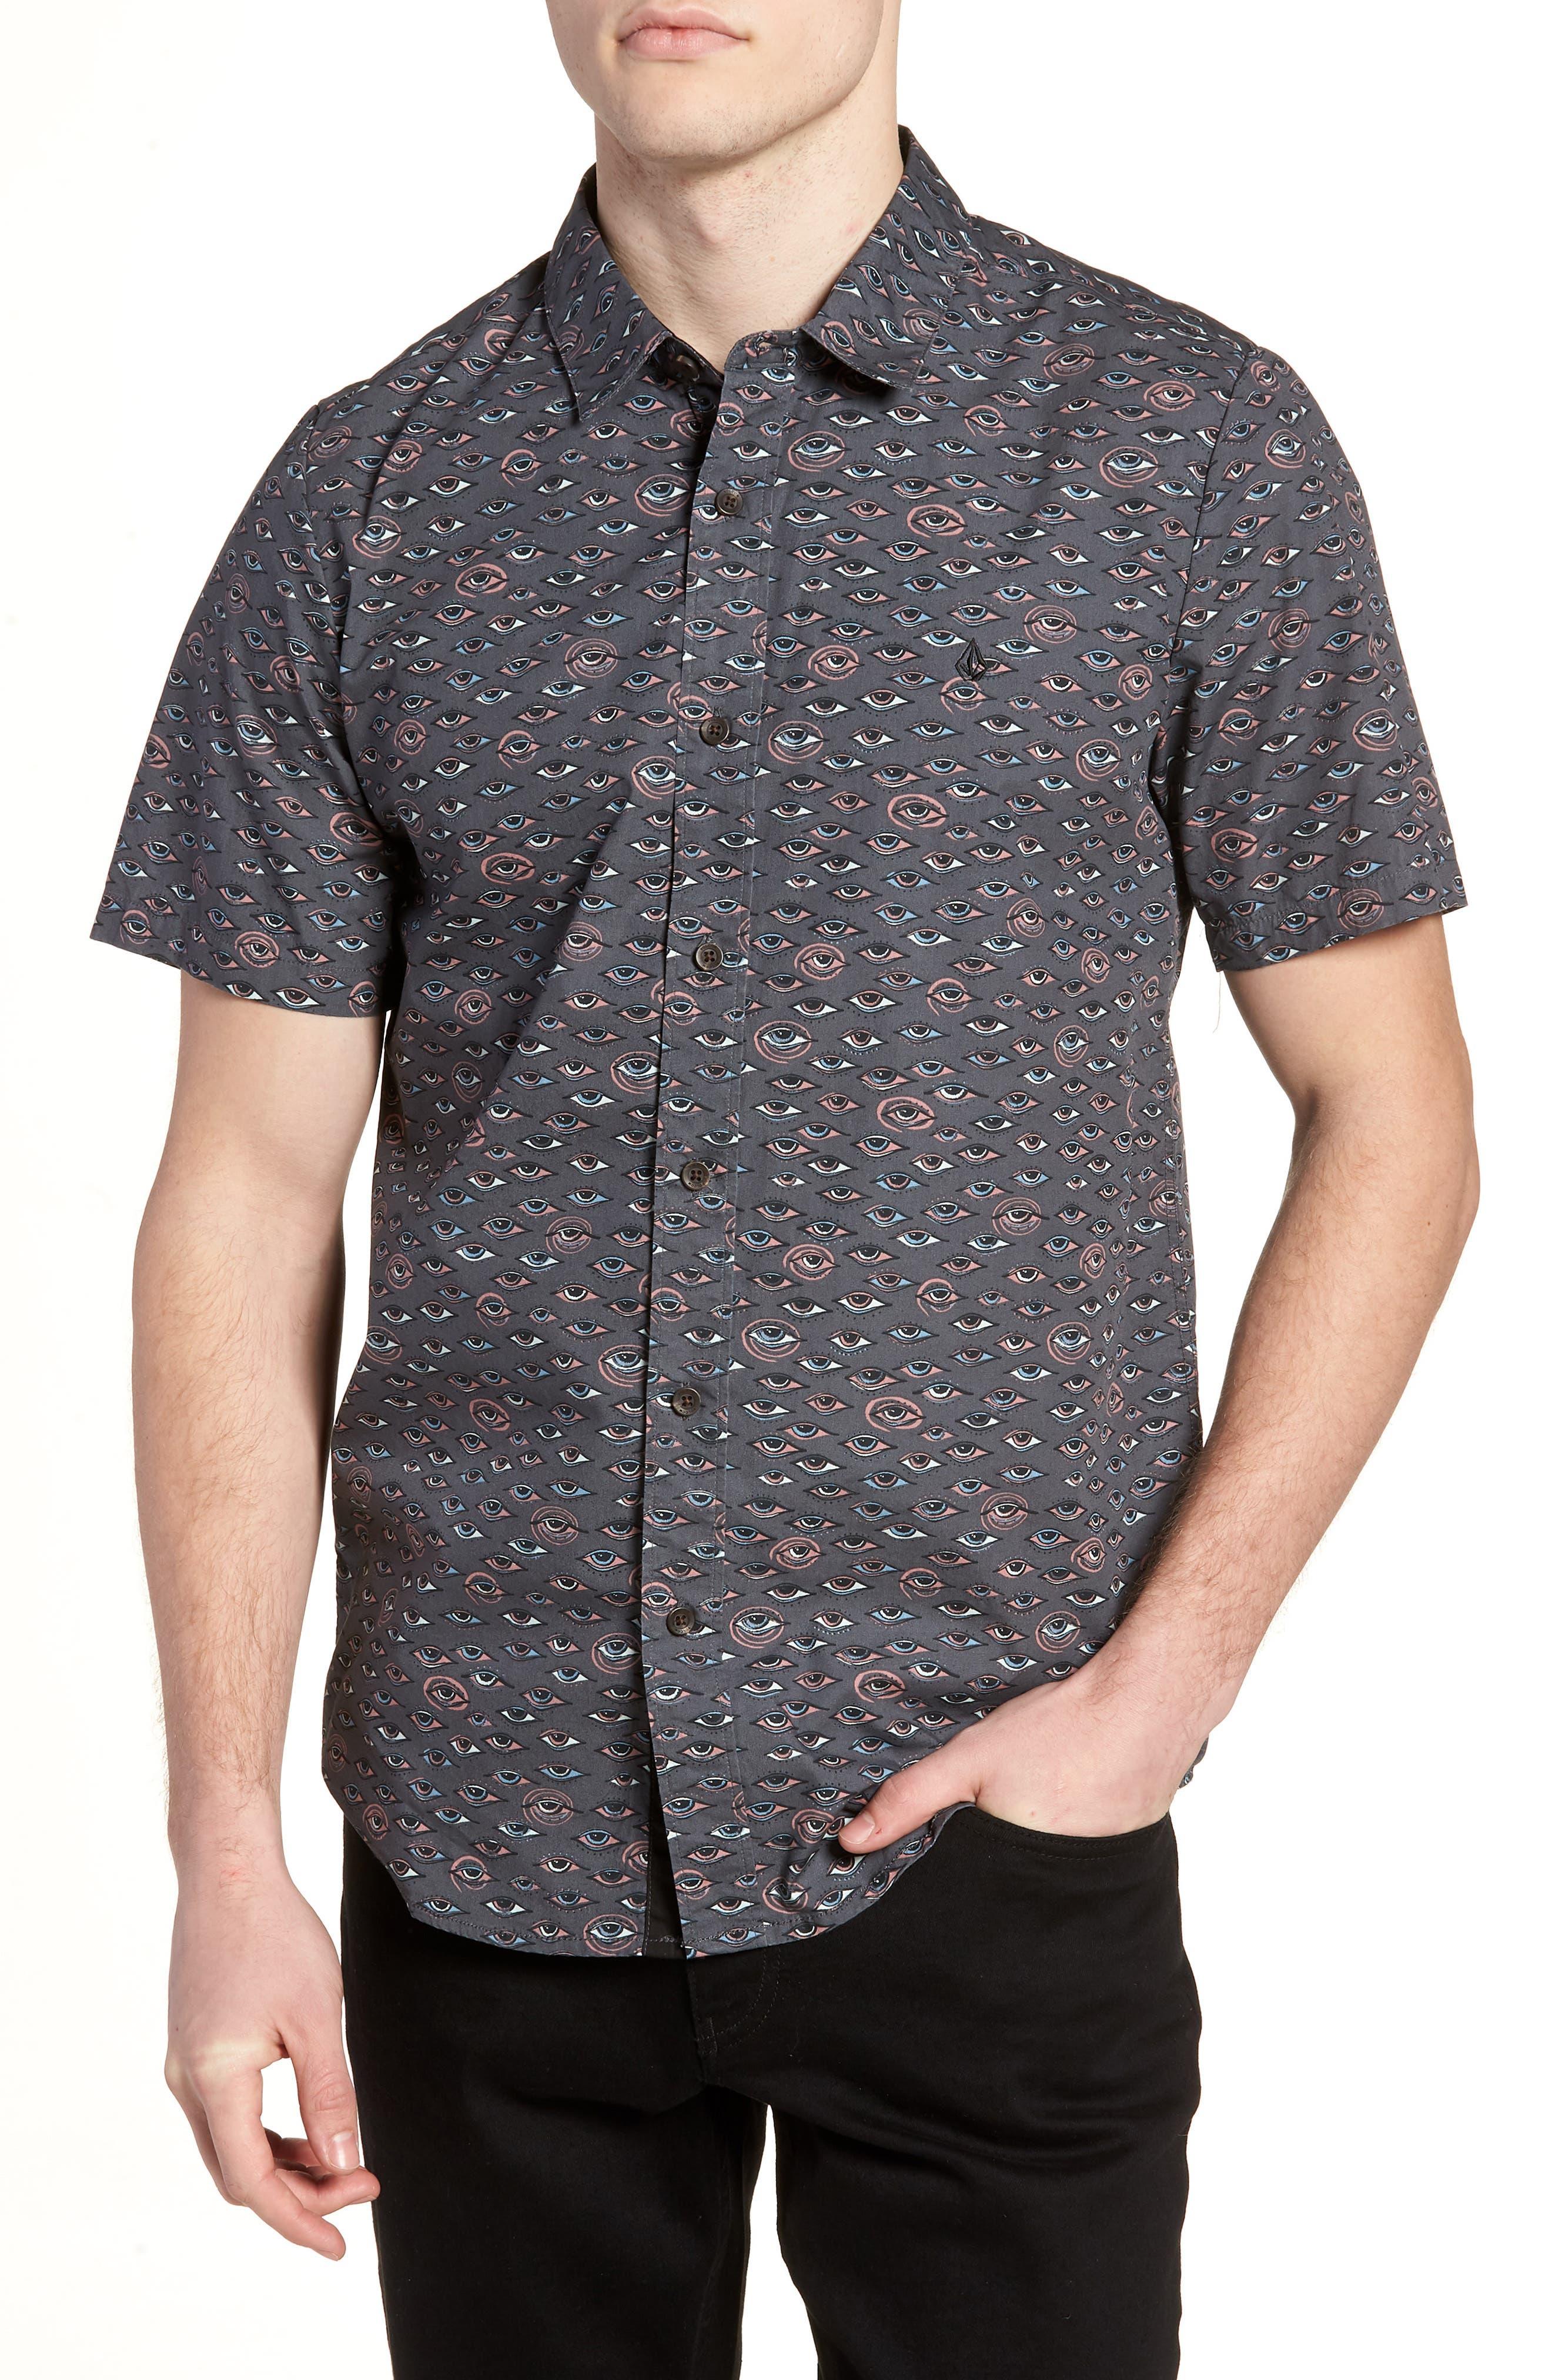 Burch Woven Shirt,                         Main,                         color, Stealth